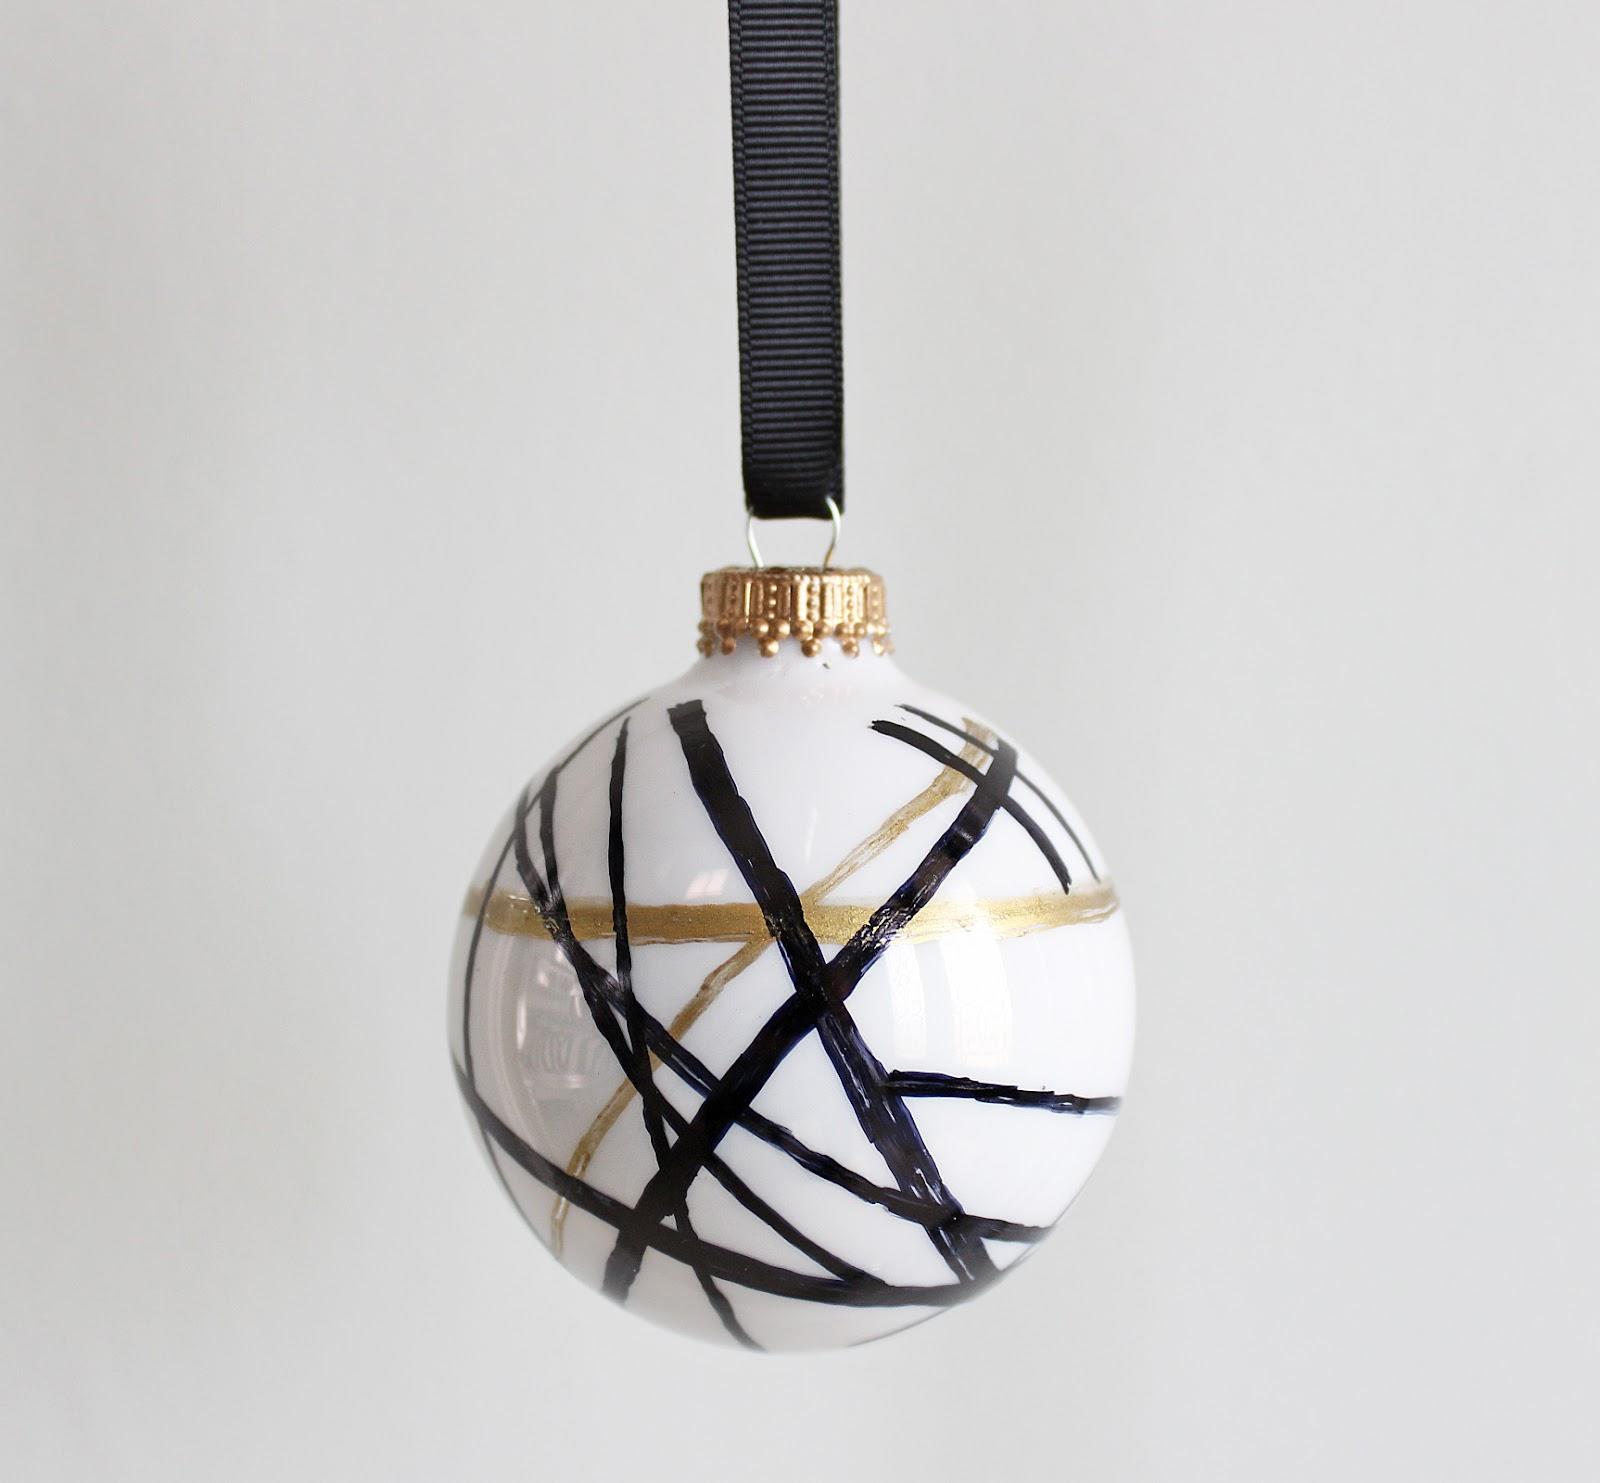 AM Dolce Vita: DIY Handpainted Holiday Ball Ornaments